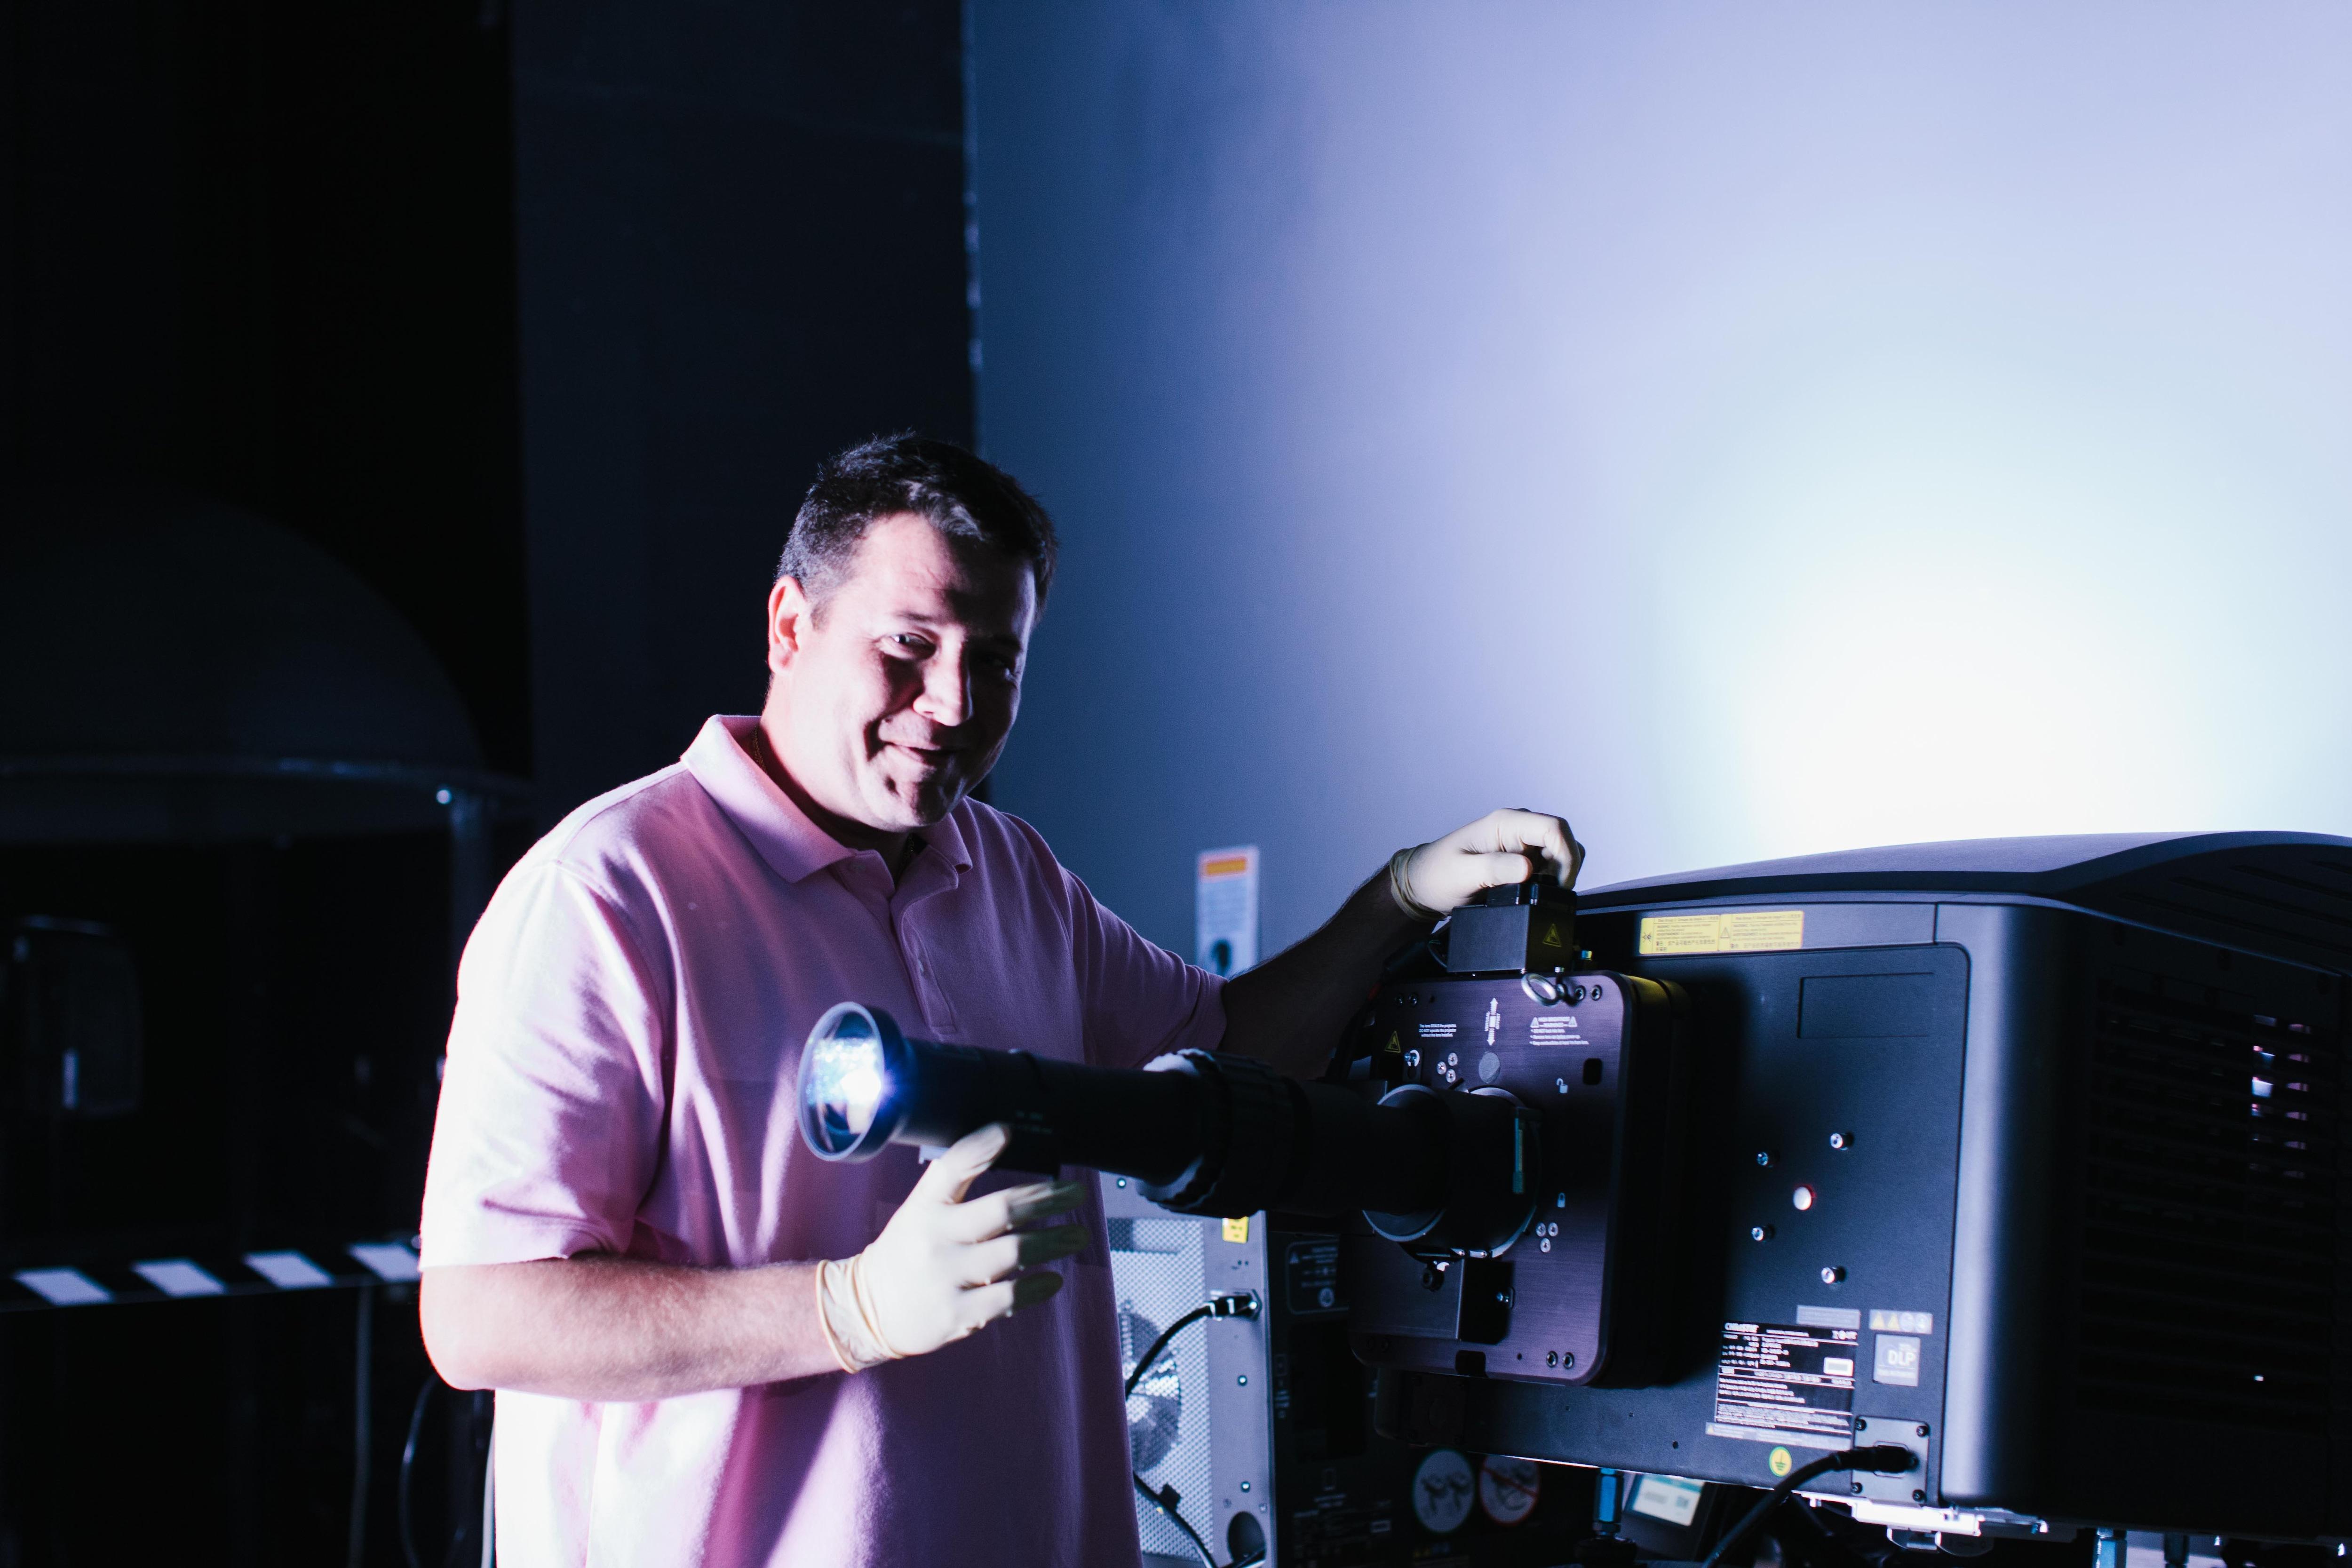 Laser Entfernungsmesser Jenoptik : Chris palermiti jenoptik